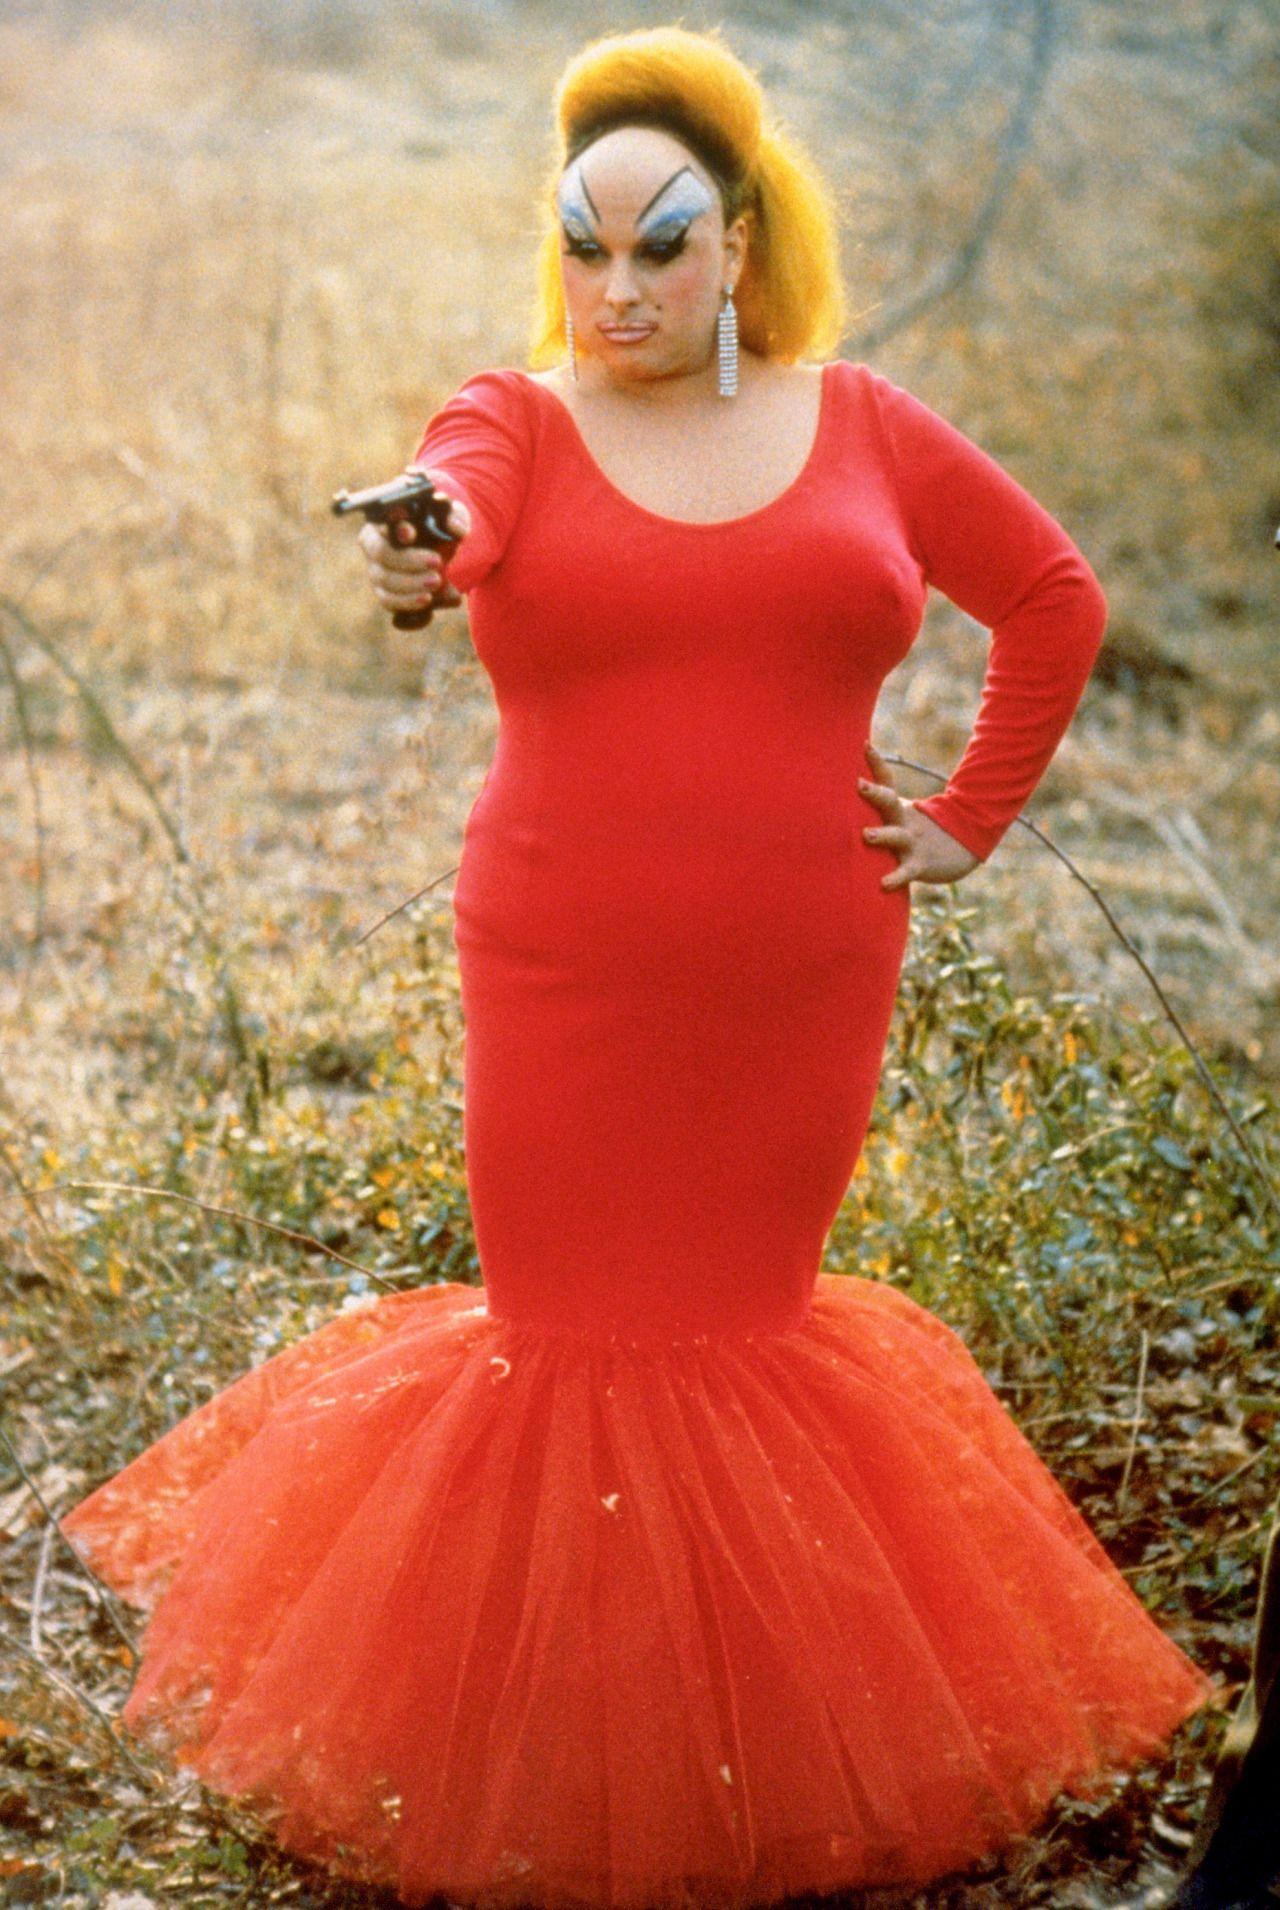 Divine Edna Turnblad